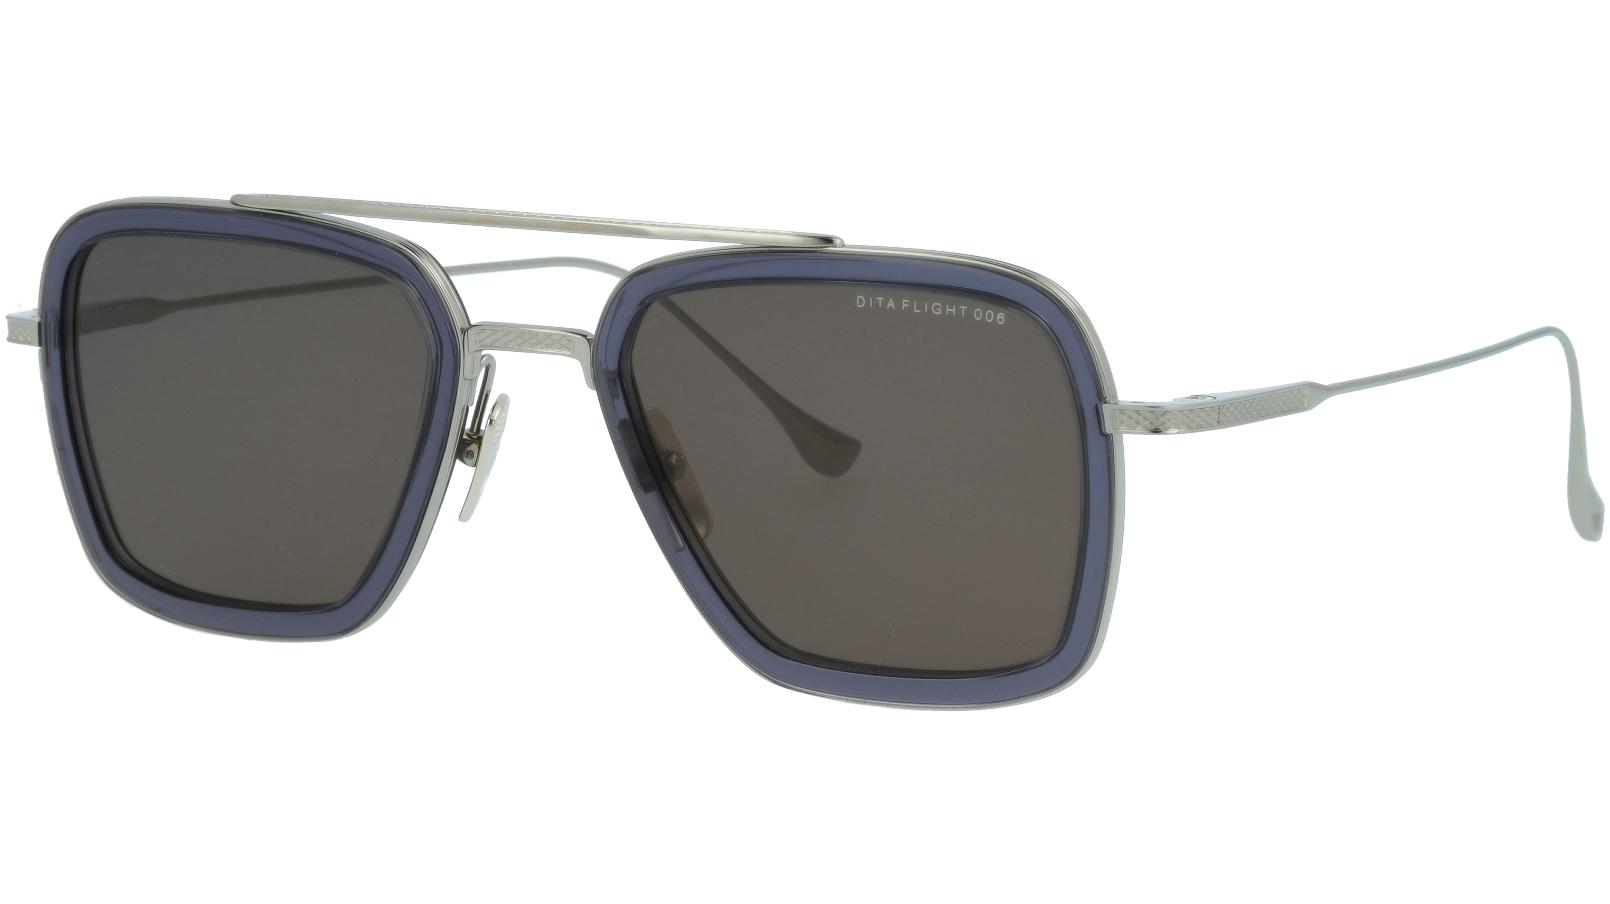 DITA FLIGHT.006 DRX7806 G-SMOKE 52 PALLADIUM Sunglasses